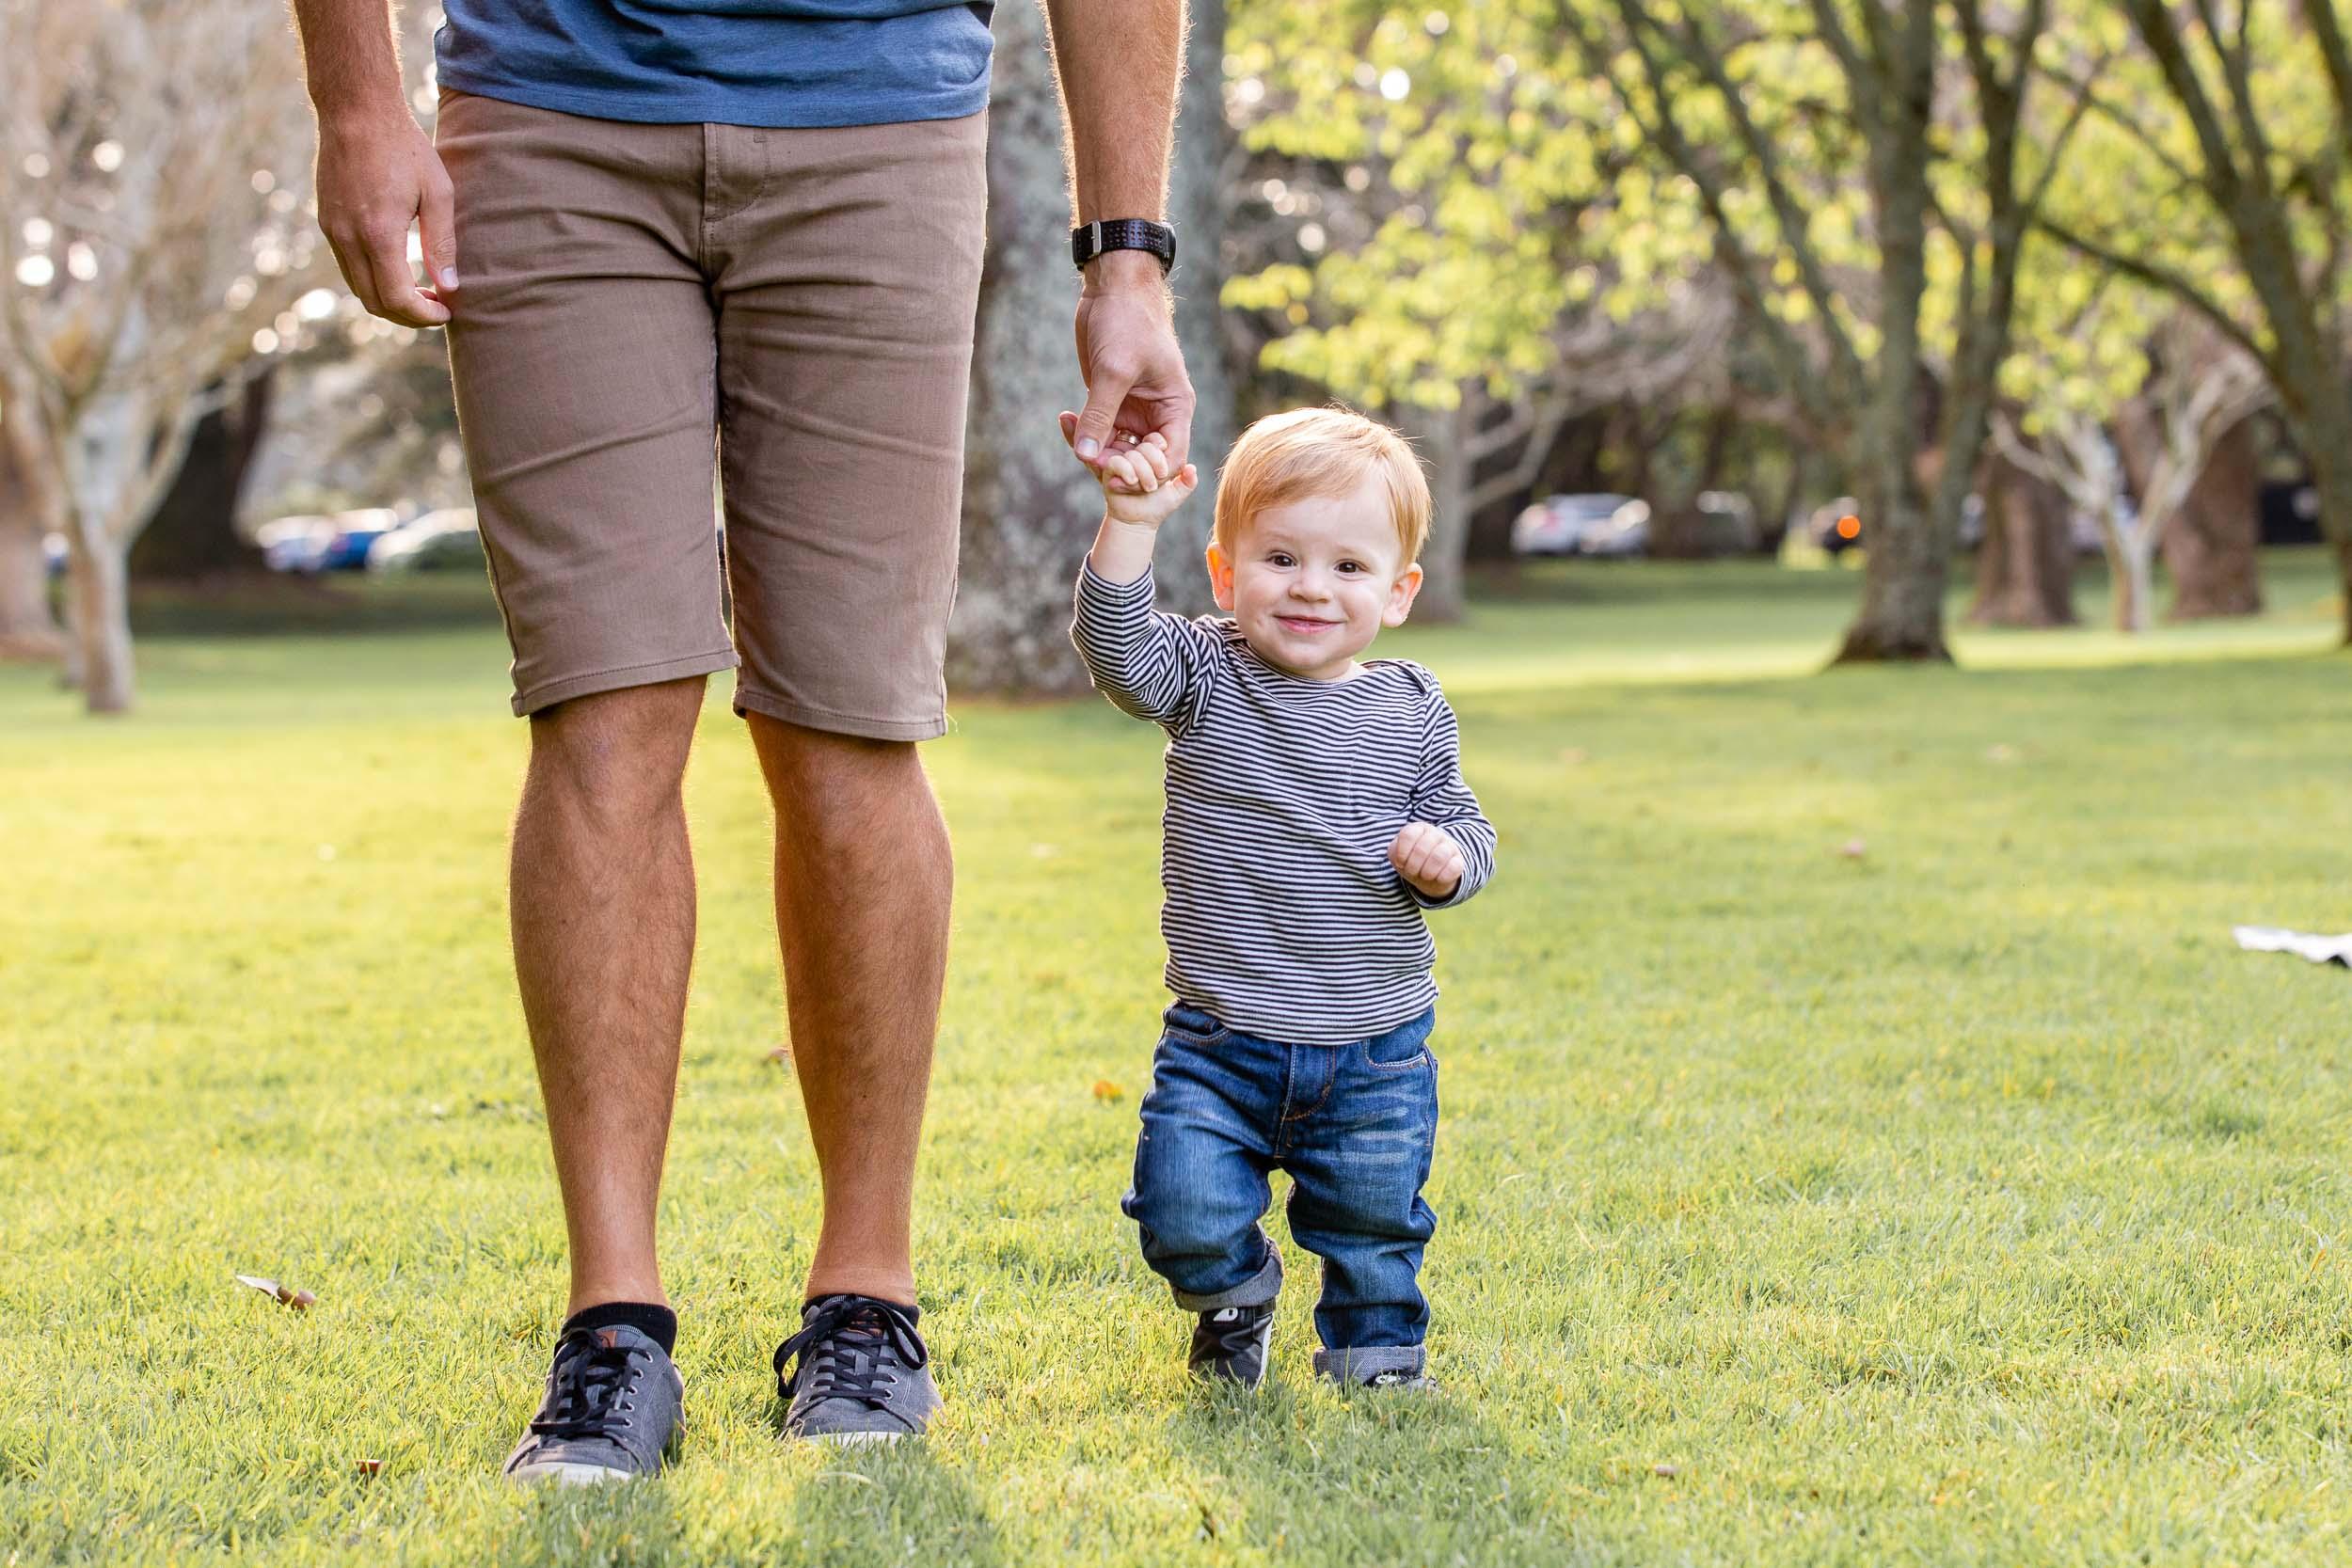 Aucklandfamilyphotographer (11 of 25).jpg